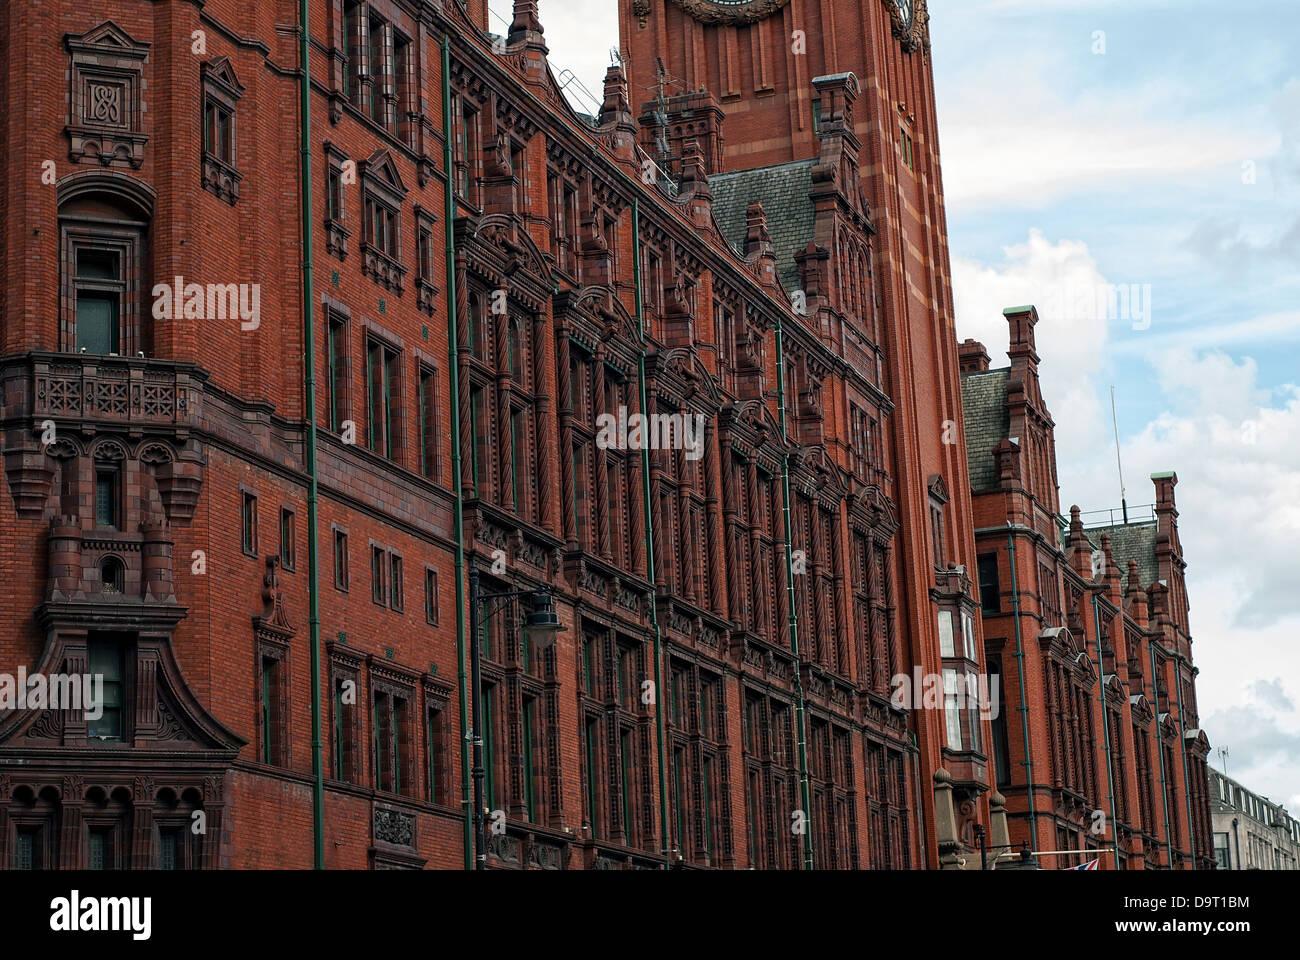 Historical Building in Manchester (Refuge Assurance Building) - Stock Image